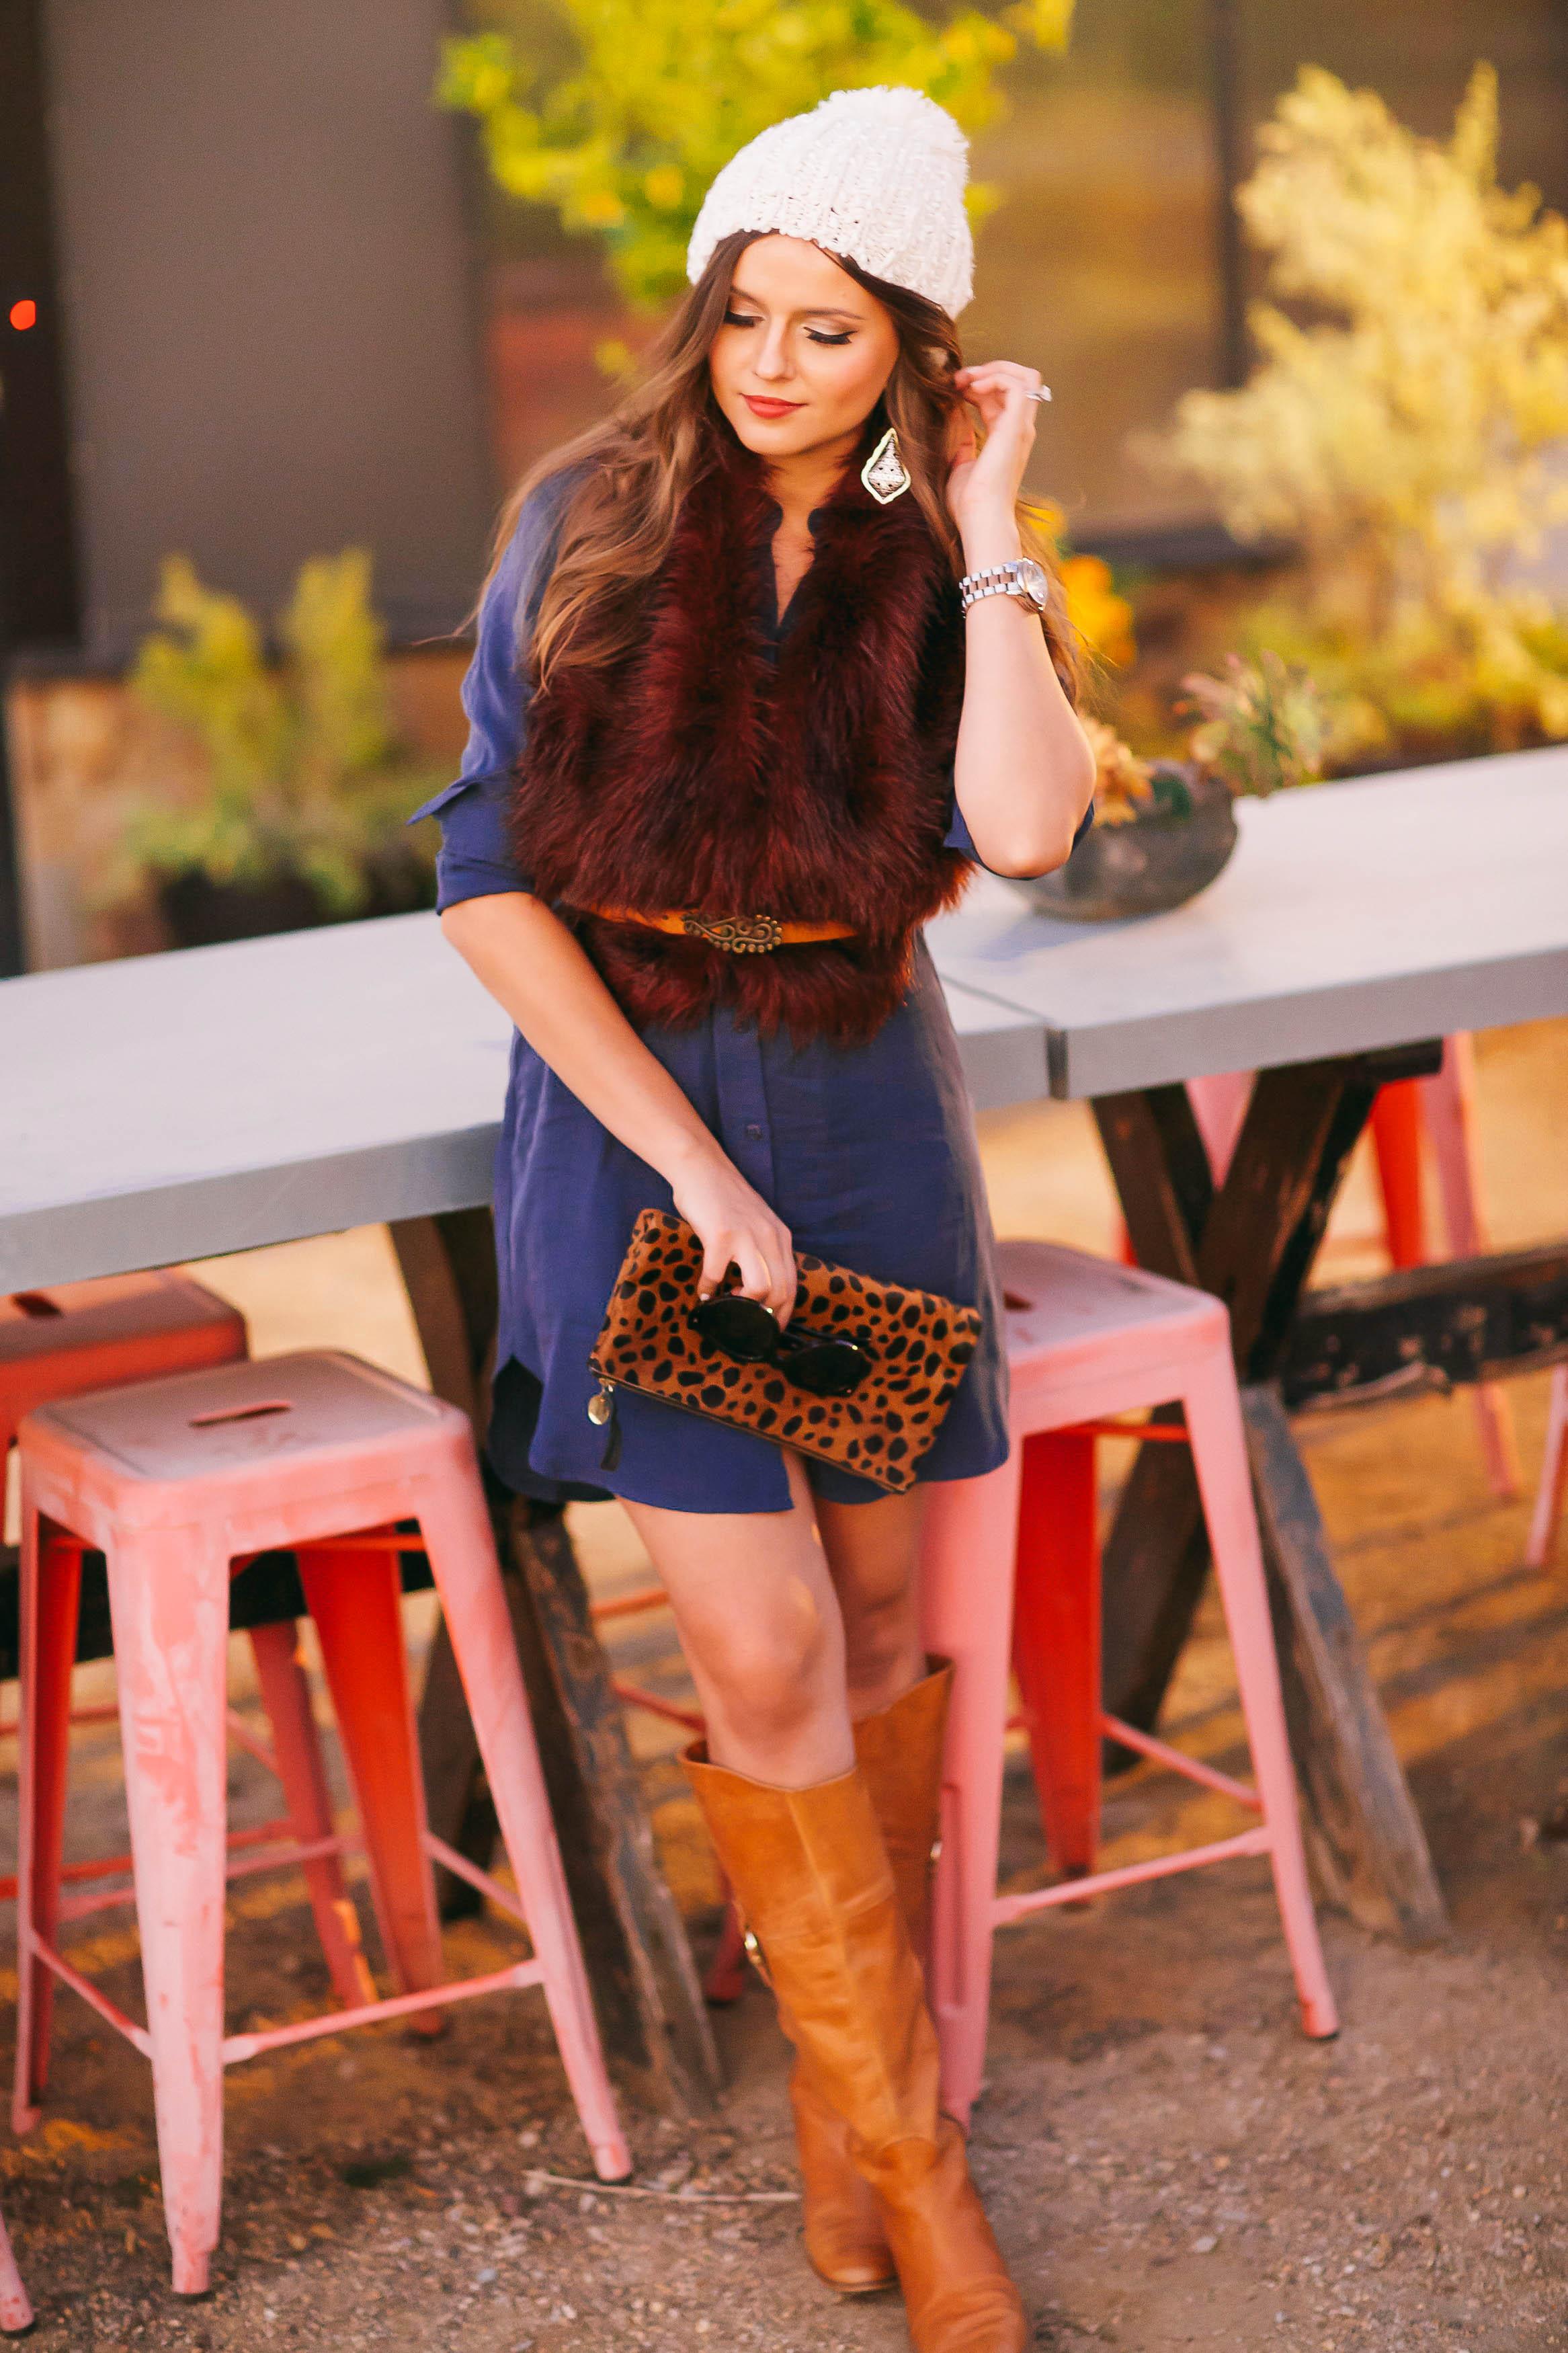 Ootd Burgundy Fur Stole Blue Shirtdress A Fashion Baby Gear Beauty